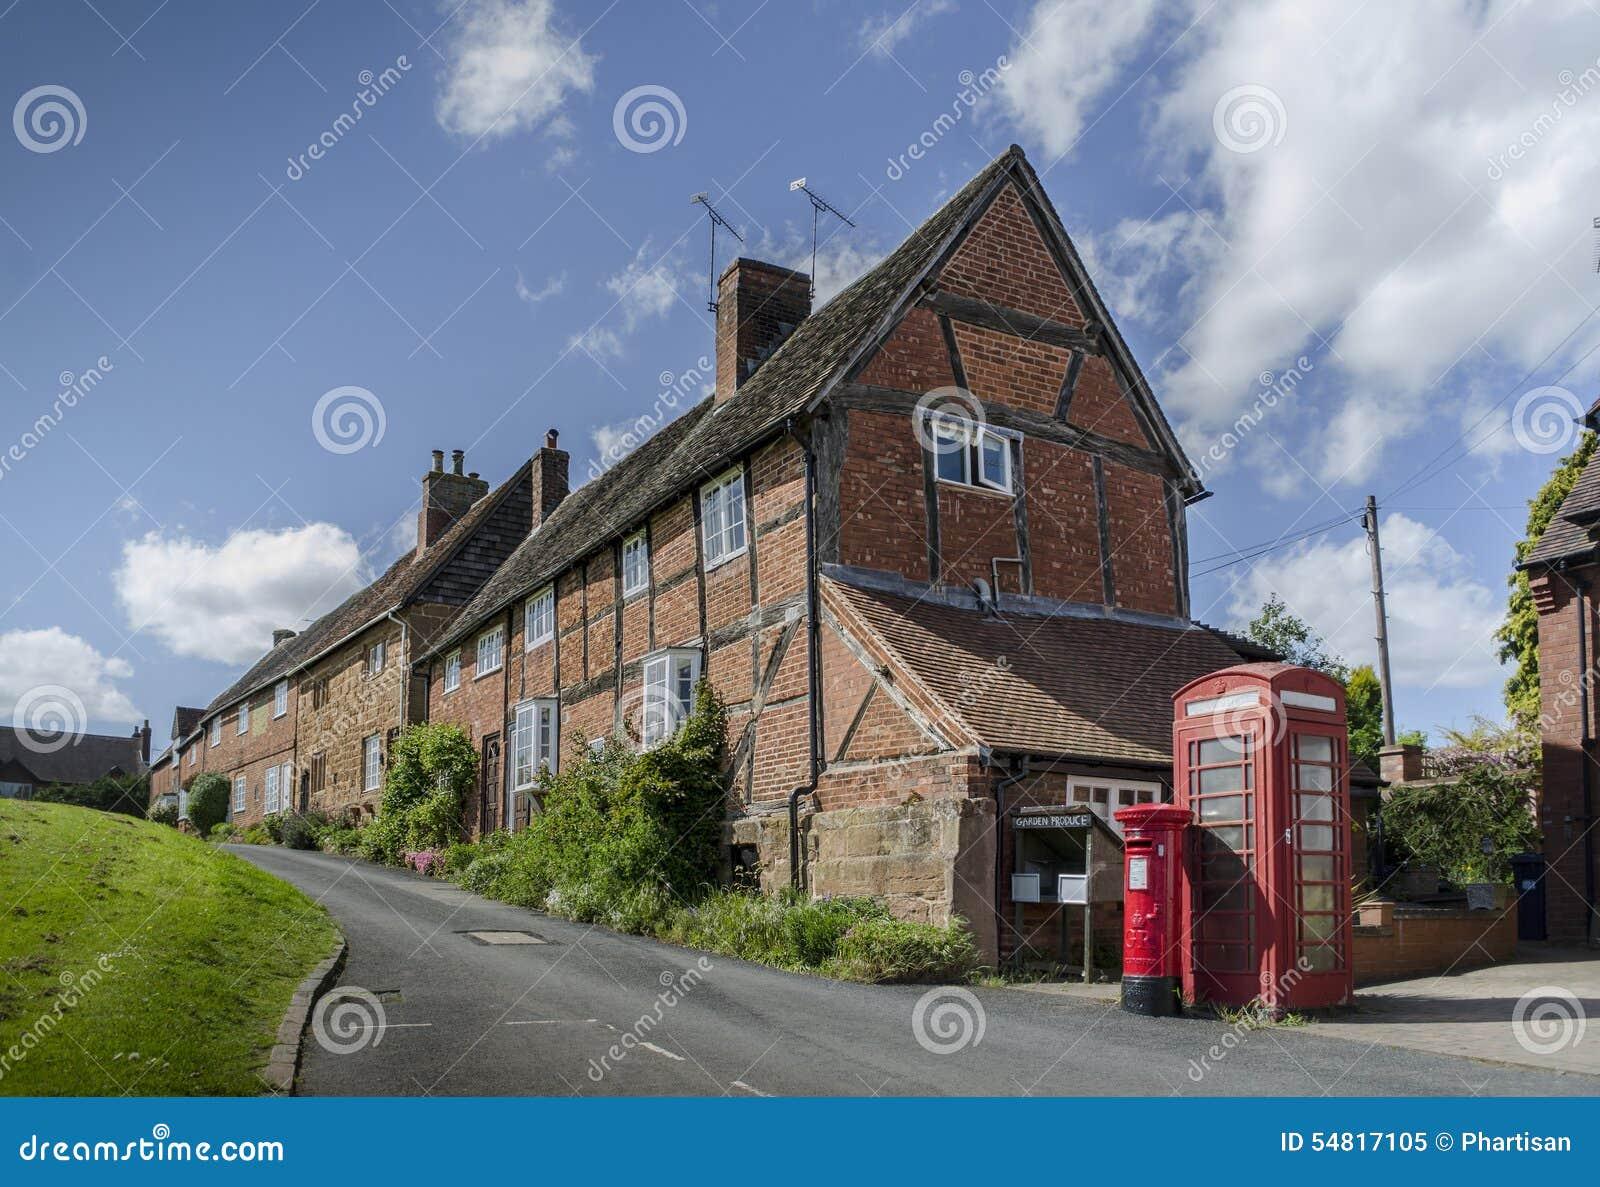 Quaint Charming British Village Scene Stock Photo Image